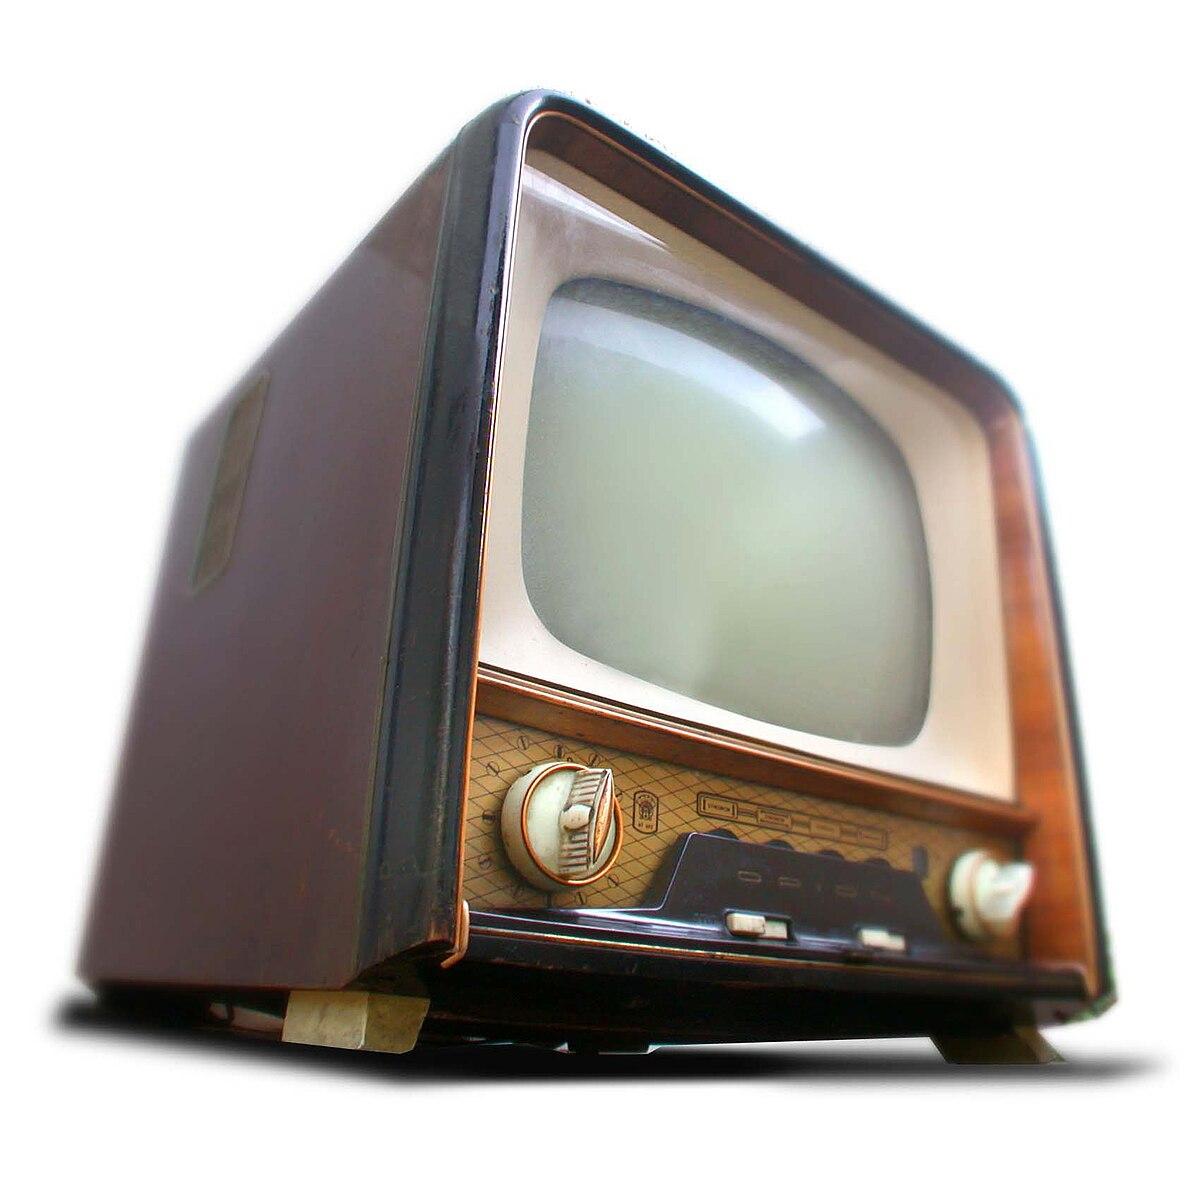 Televison Hungarian ORION 1957.jpg